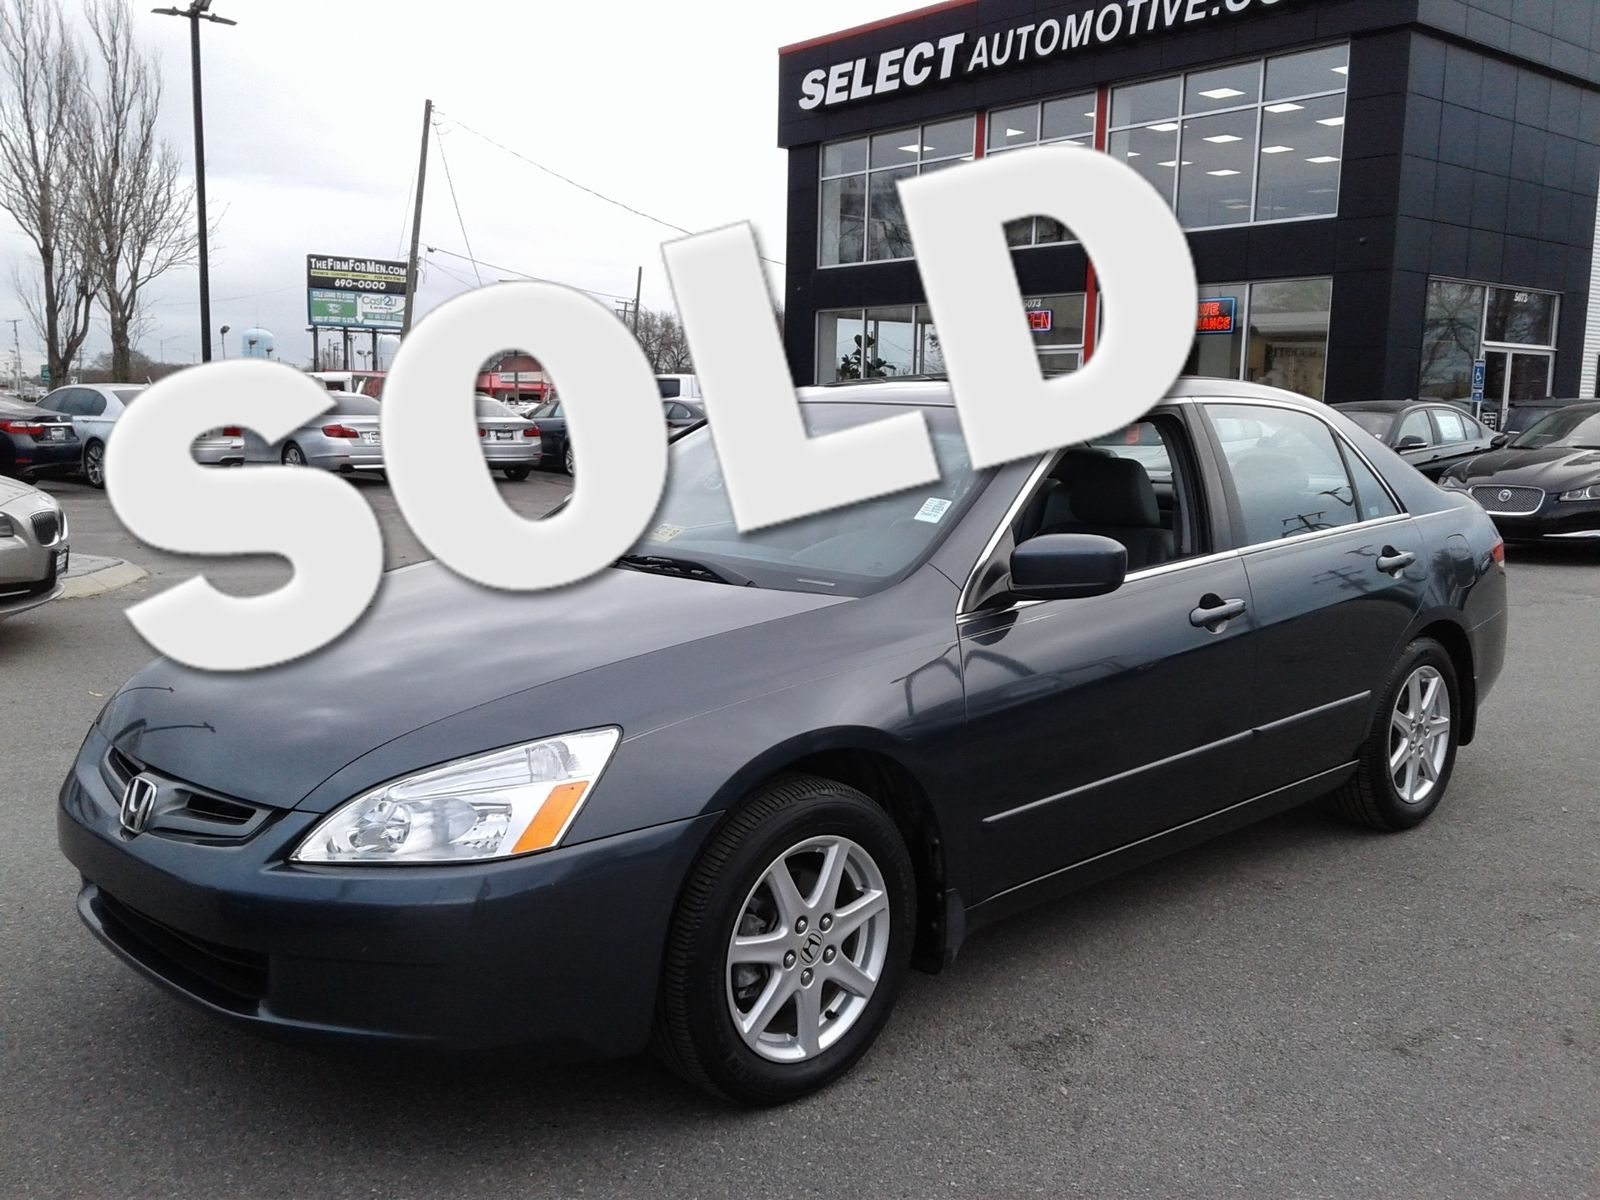 2004 Honda Accord EX city Virginia Select Automotive VA